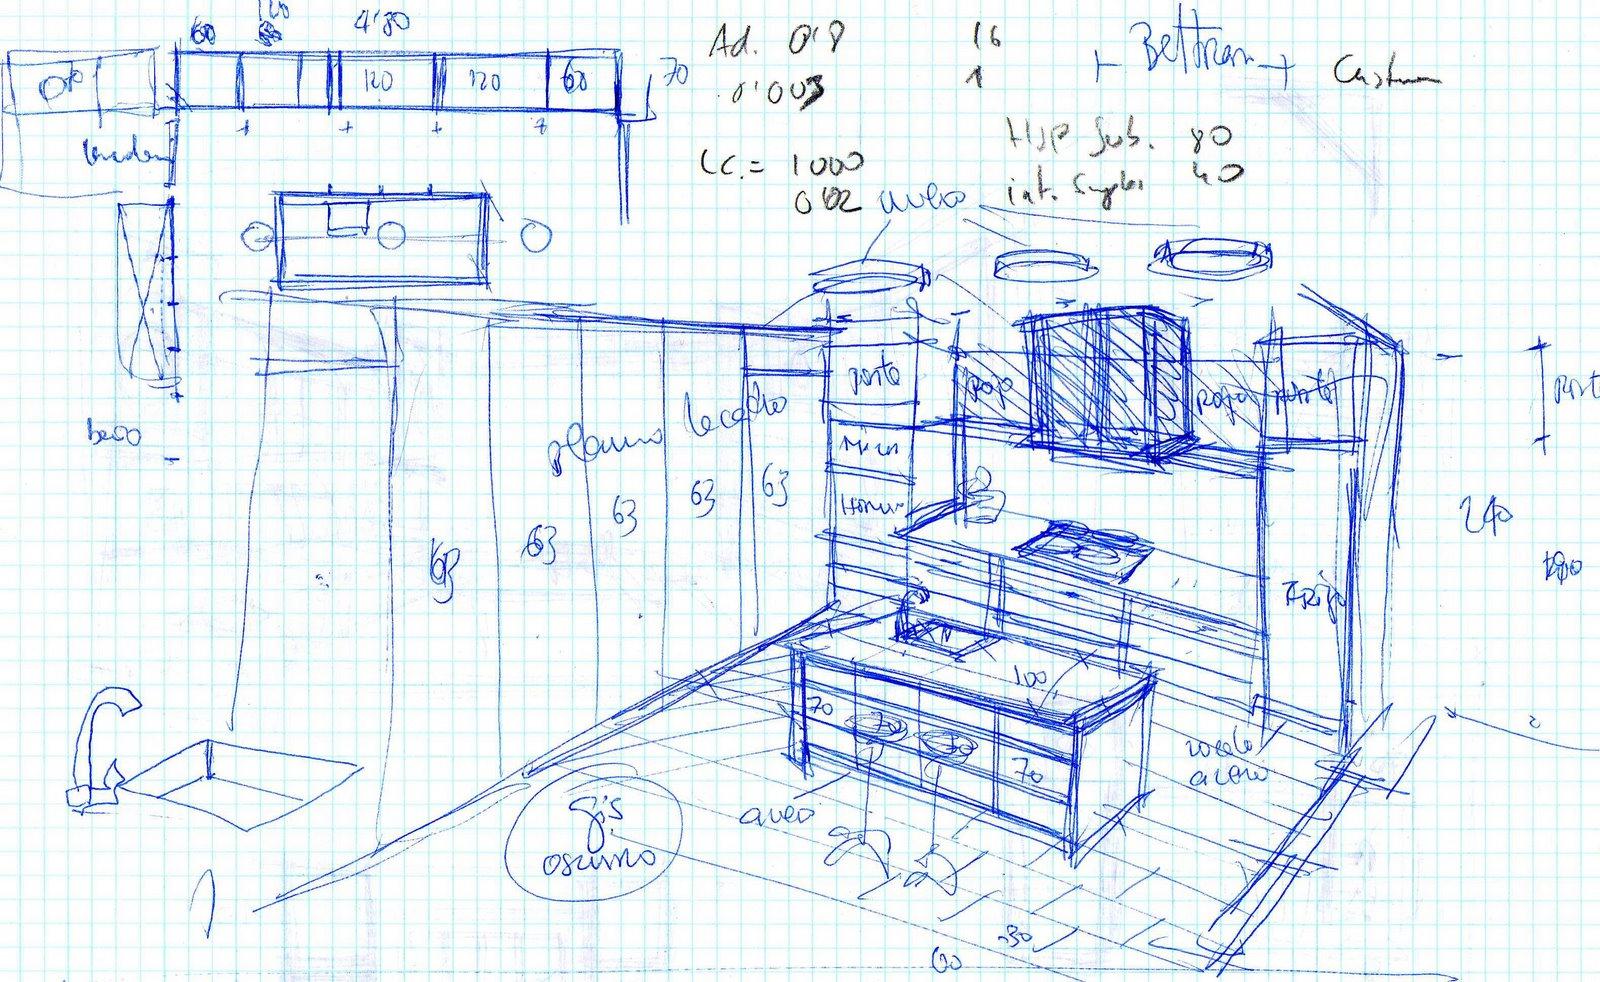 Kitchen sketch mr morrison kitchen sketch malvernweather Image collections